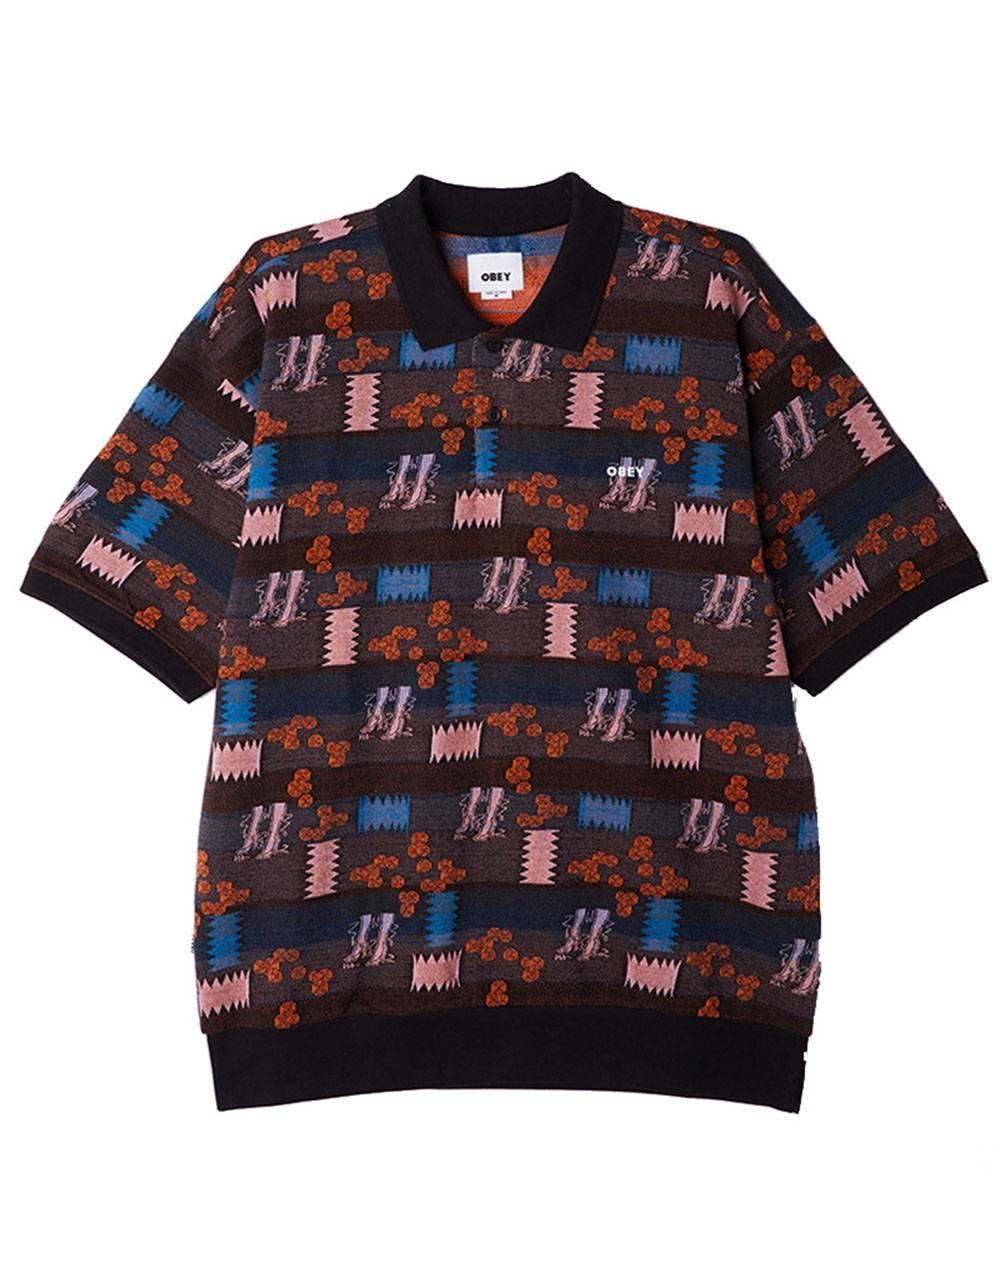 Obey Eddy knit polo - black multi obey T-shirt 80,00€